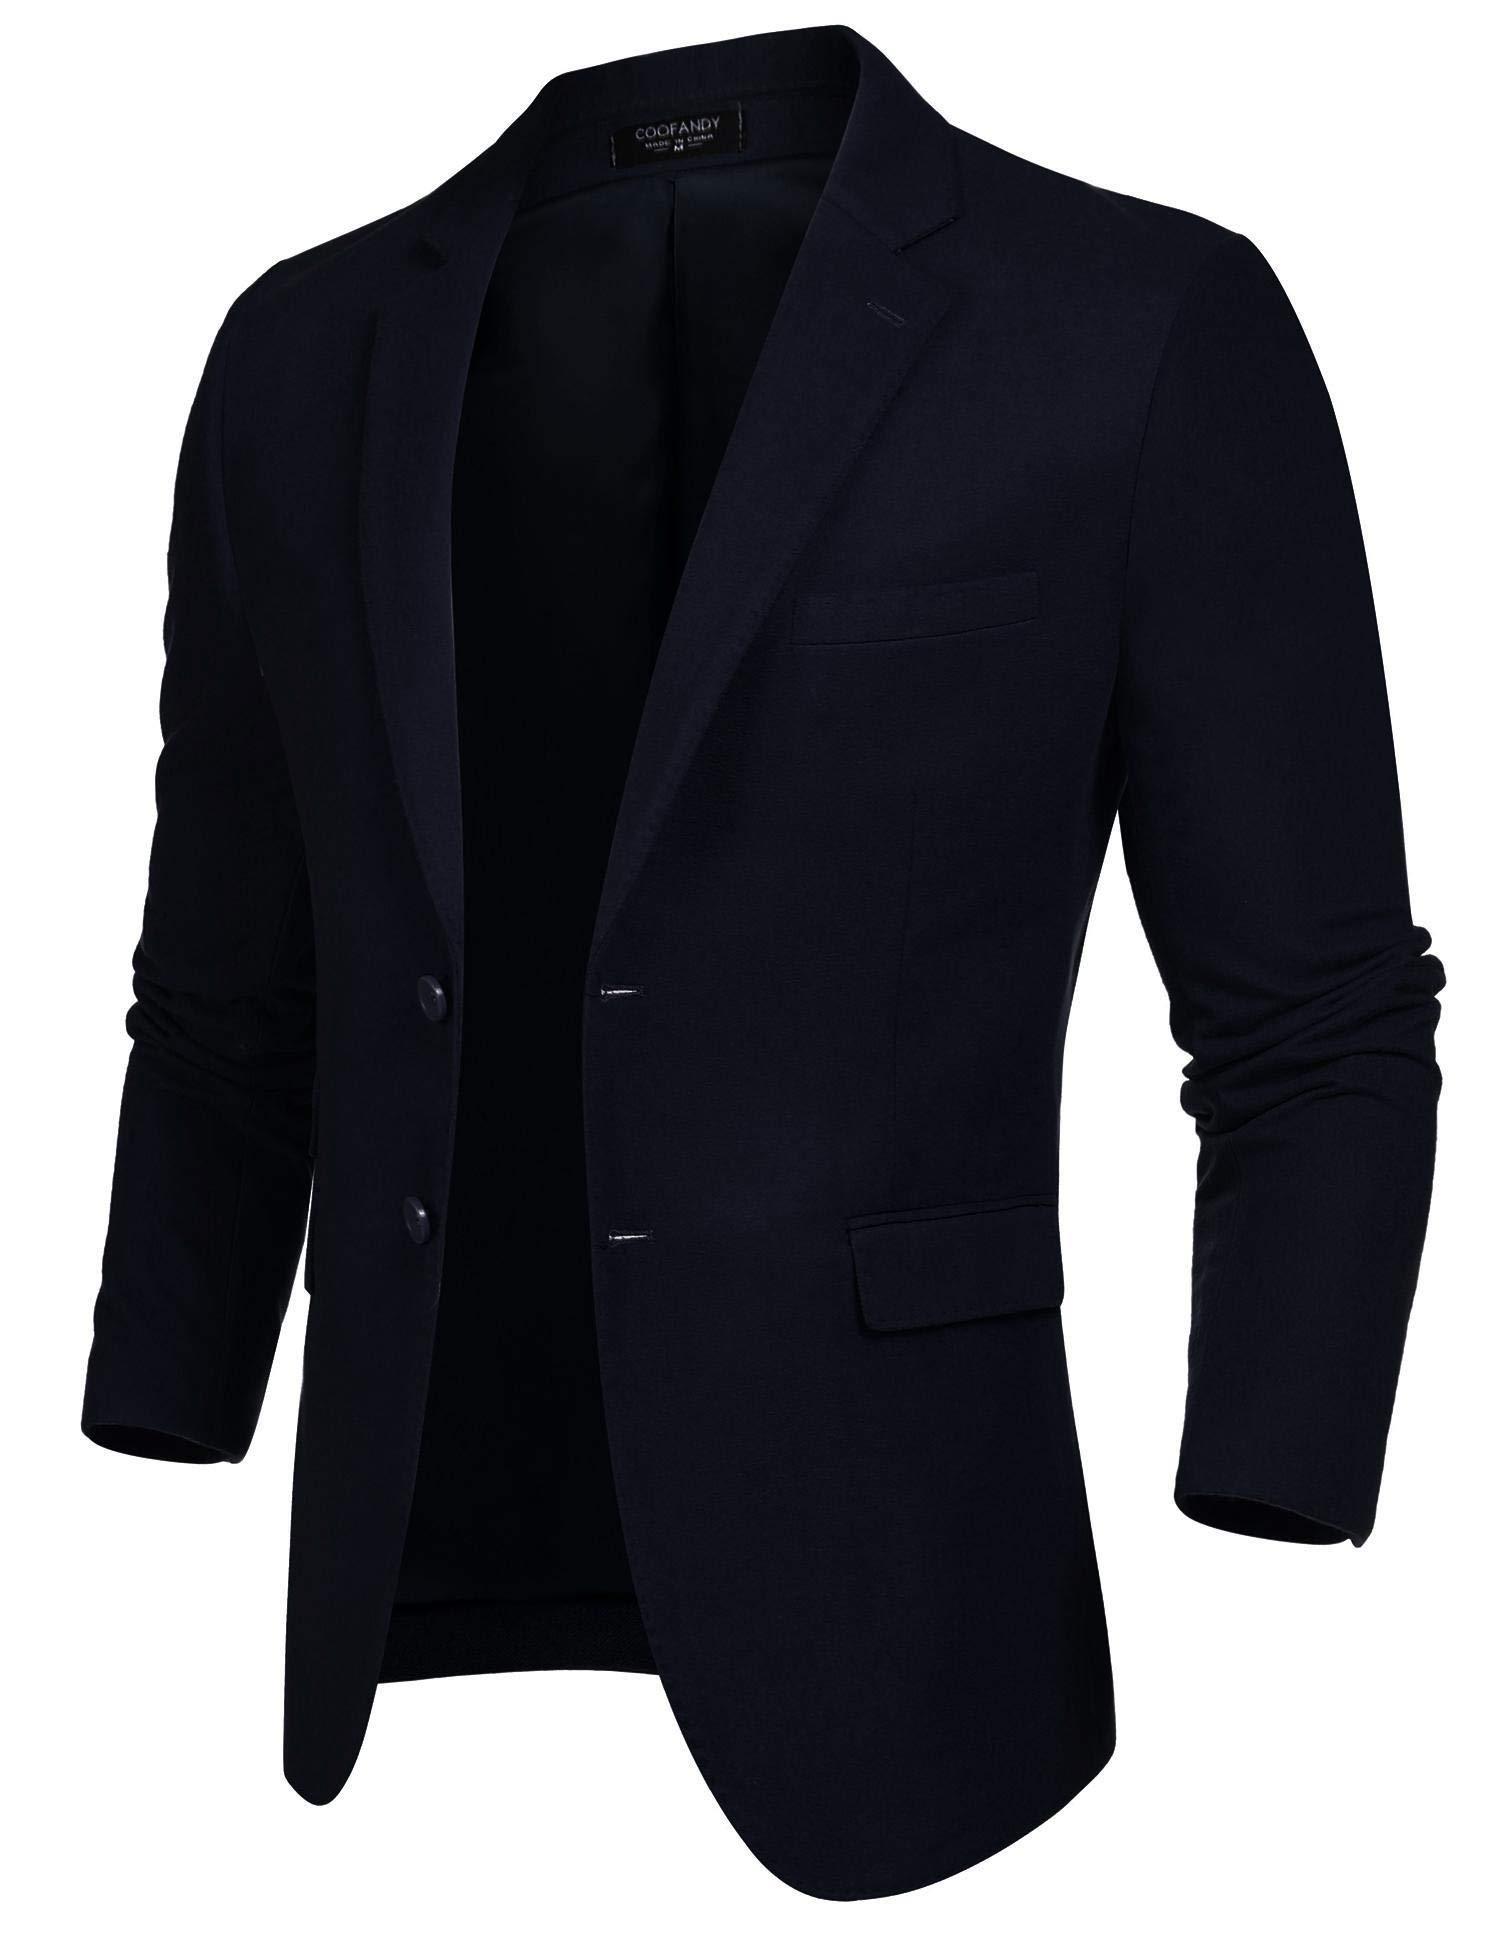 Coofandy Men's Elegant Regular Fit Two Button Slim Fit Suit Blazer Jacket,Blue,Large